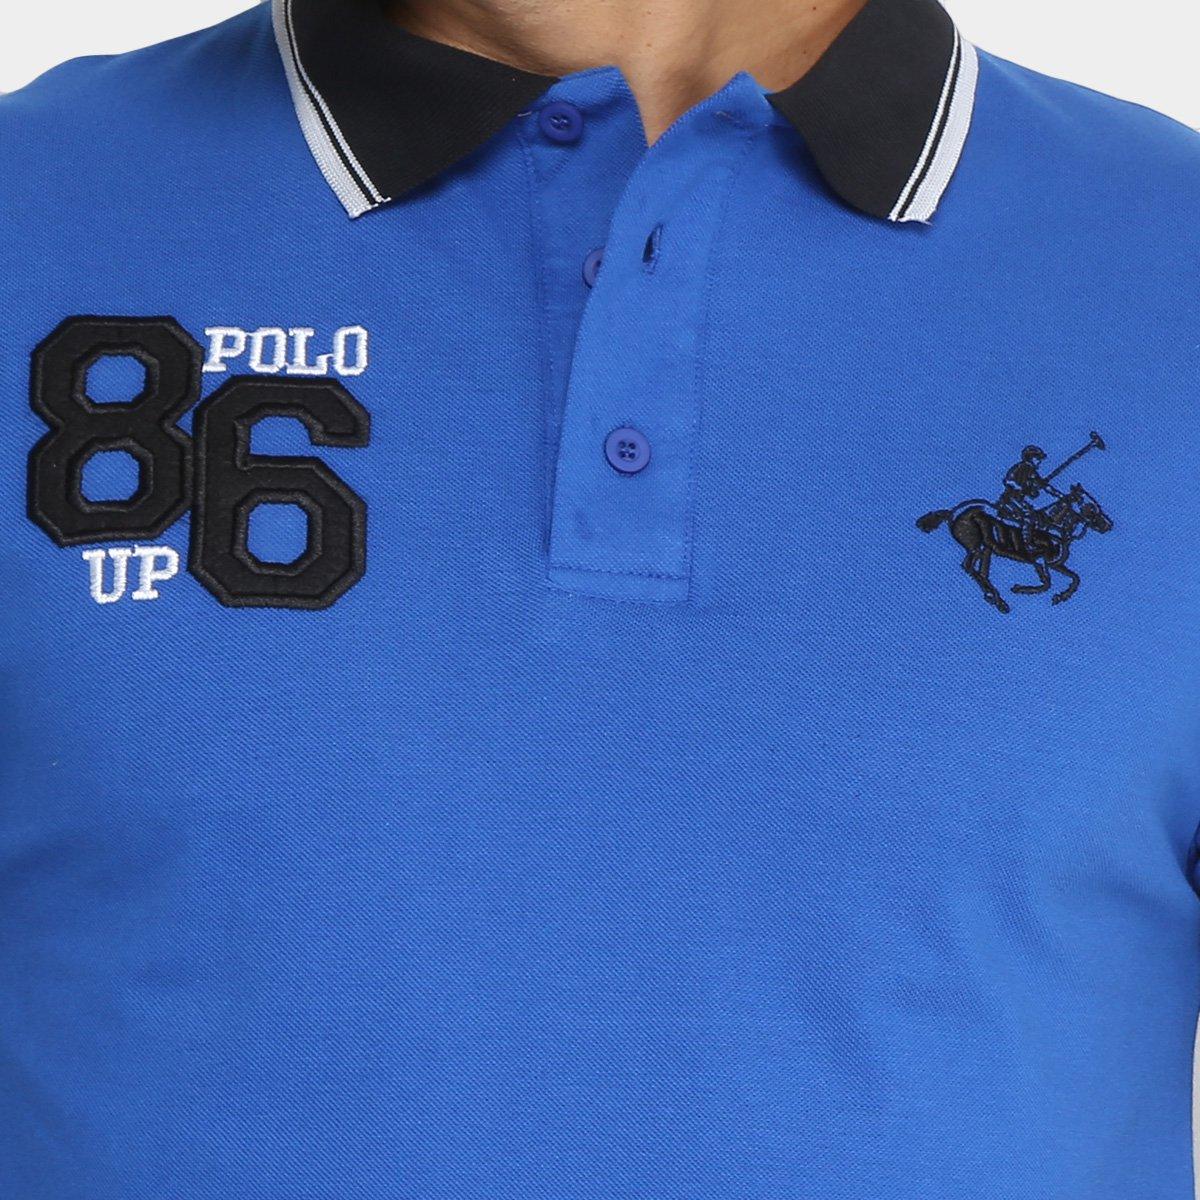 4d415a3ffb Camisa Polo Polo Up com Bordado Masculina - Azul Royal - Compre ...